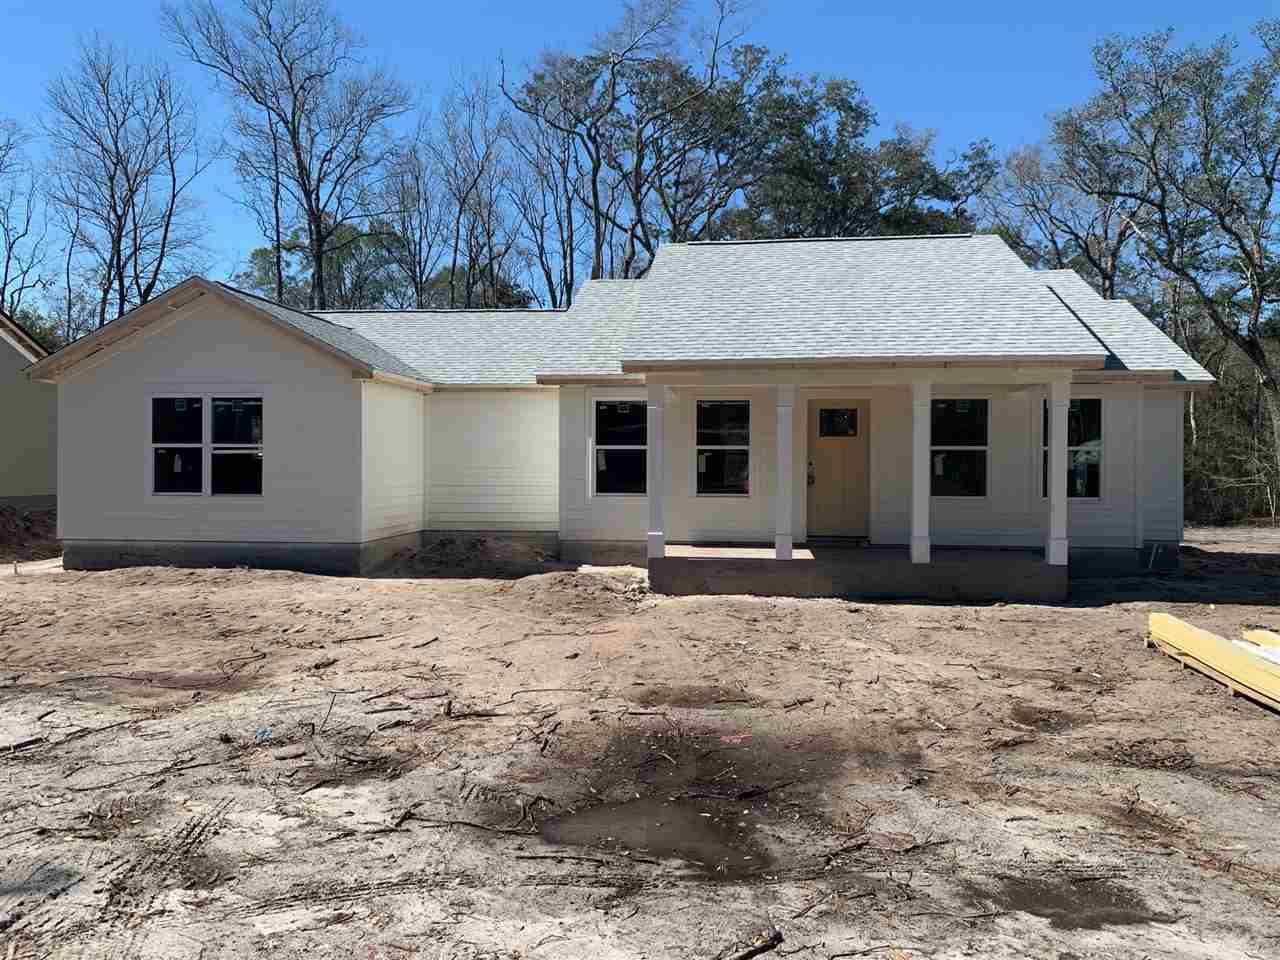 34 Lee, CRAWFORDVILLE, Florida 32327, 4 Bedrooms Bedrooms, ,2 BathroomsBathrooms,Single Family,For Sale,34 Lee,1,325553